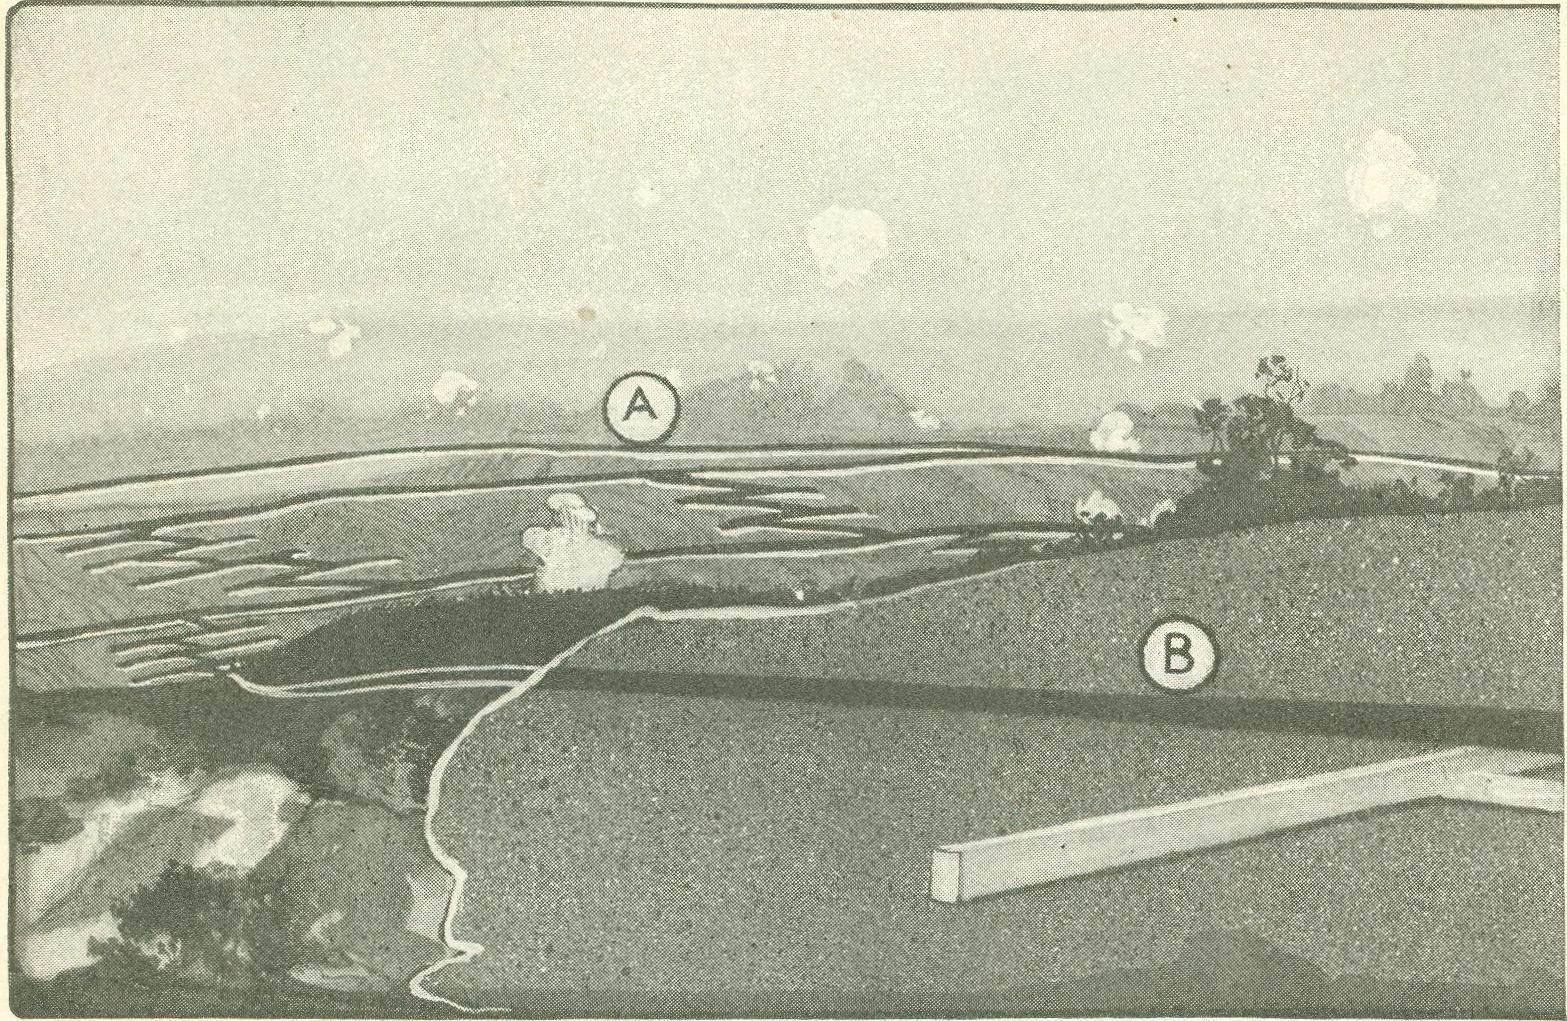 Ww1 Trench System Diagram Lucas Wiper Motor Wiring Digital History Project Warfare In World War I